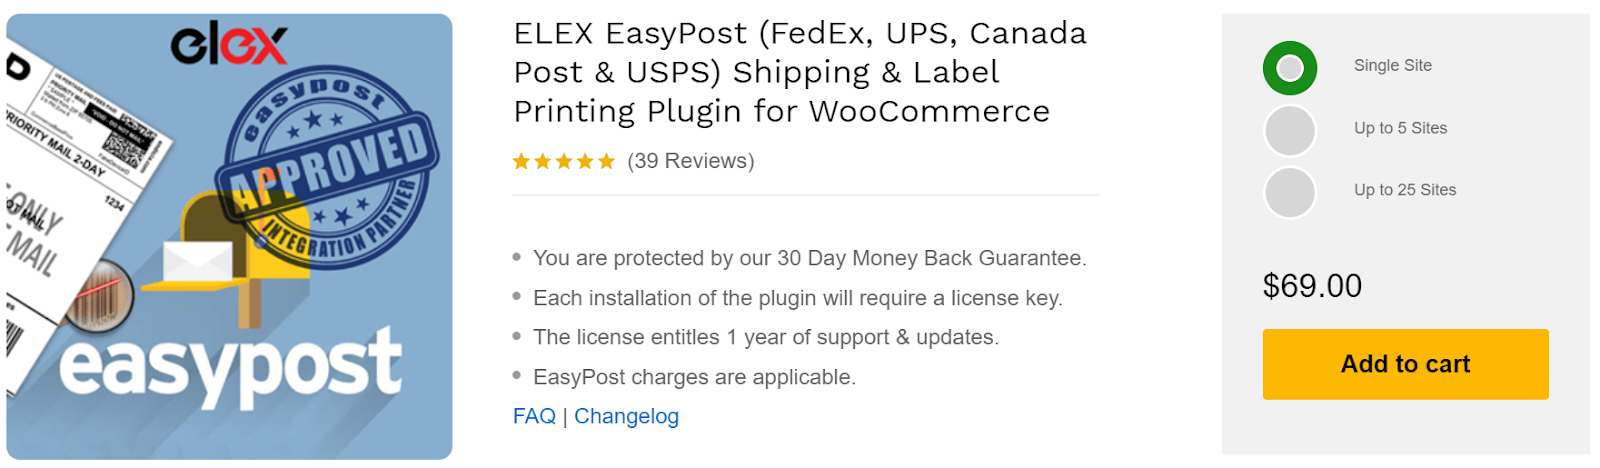 easypost plugin, woocommerce shipping plugins